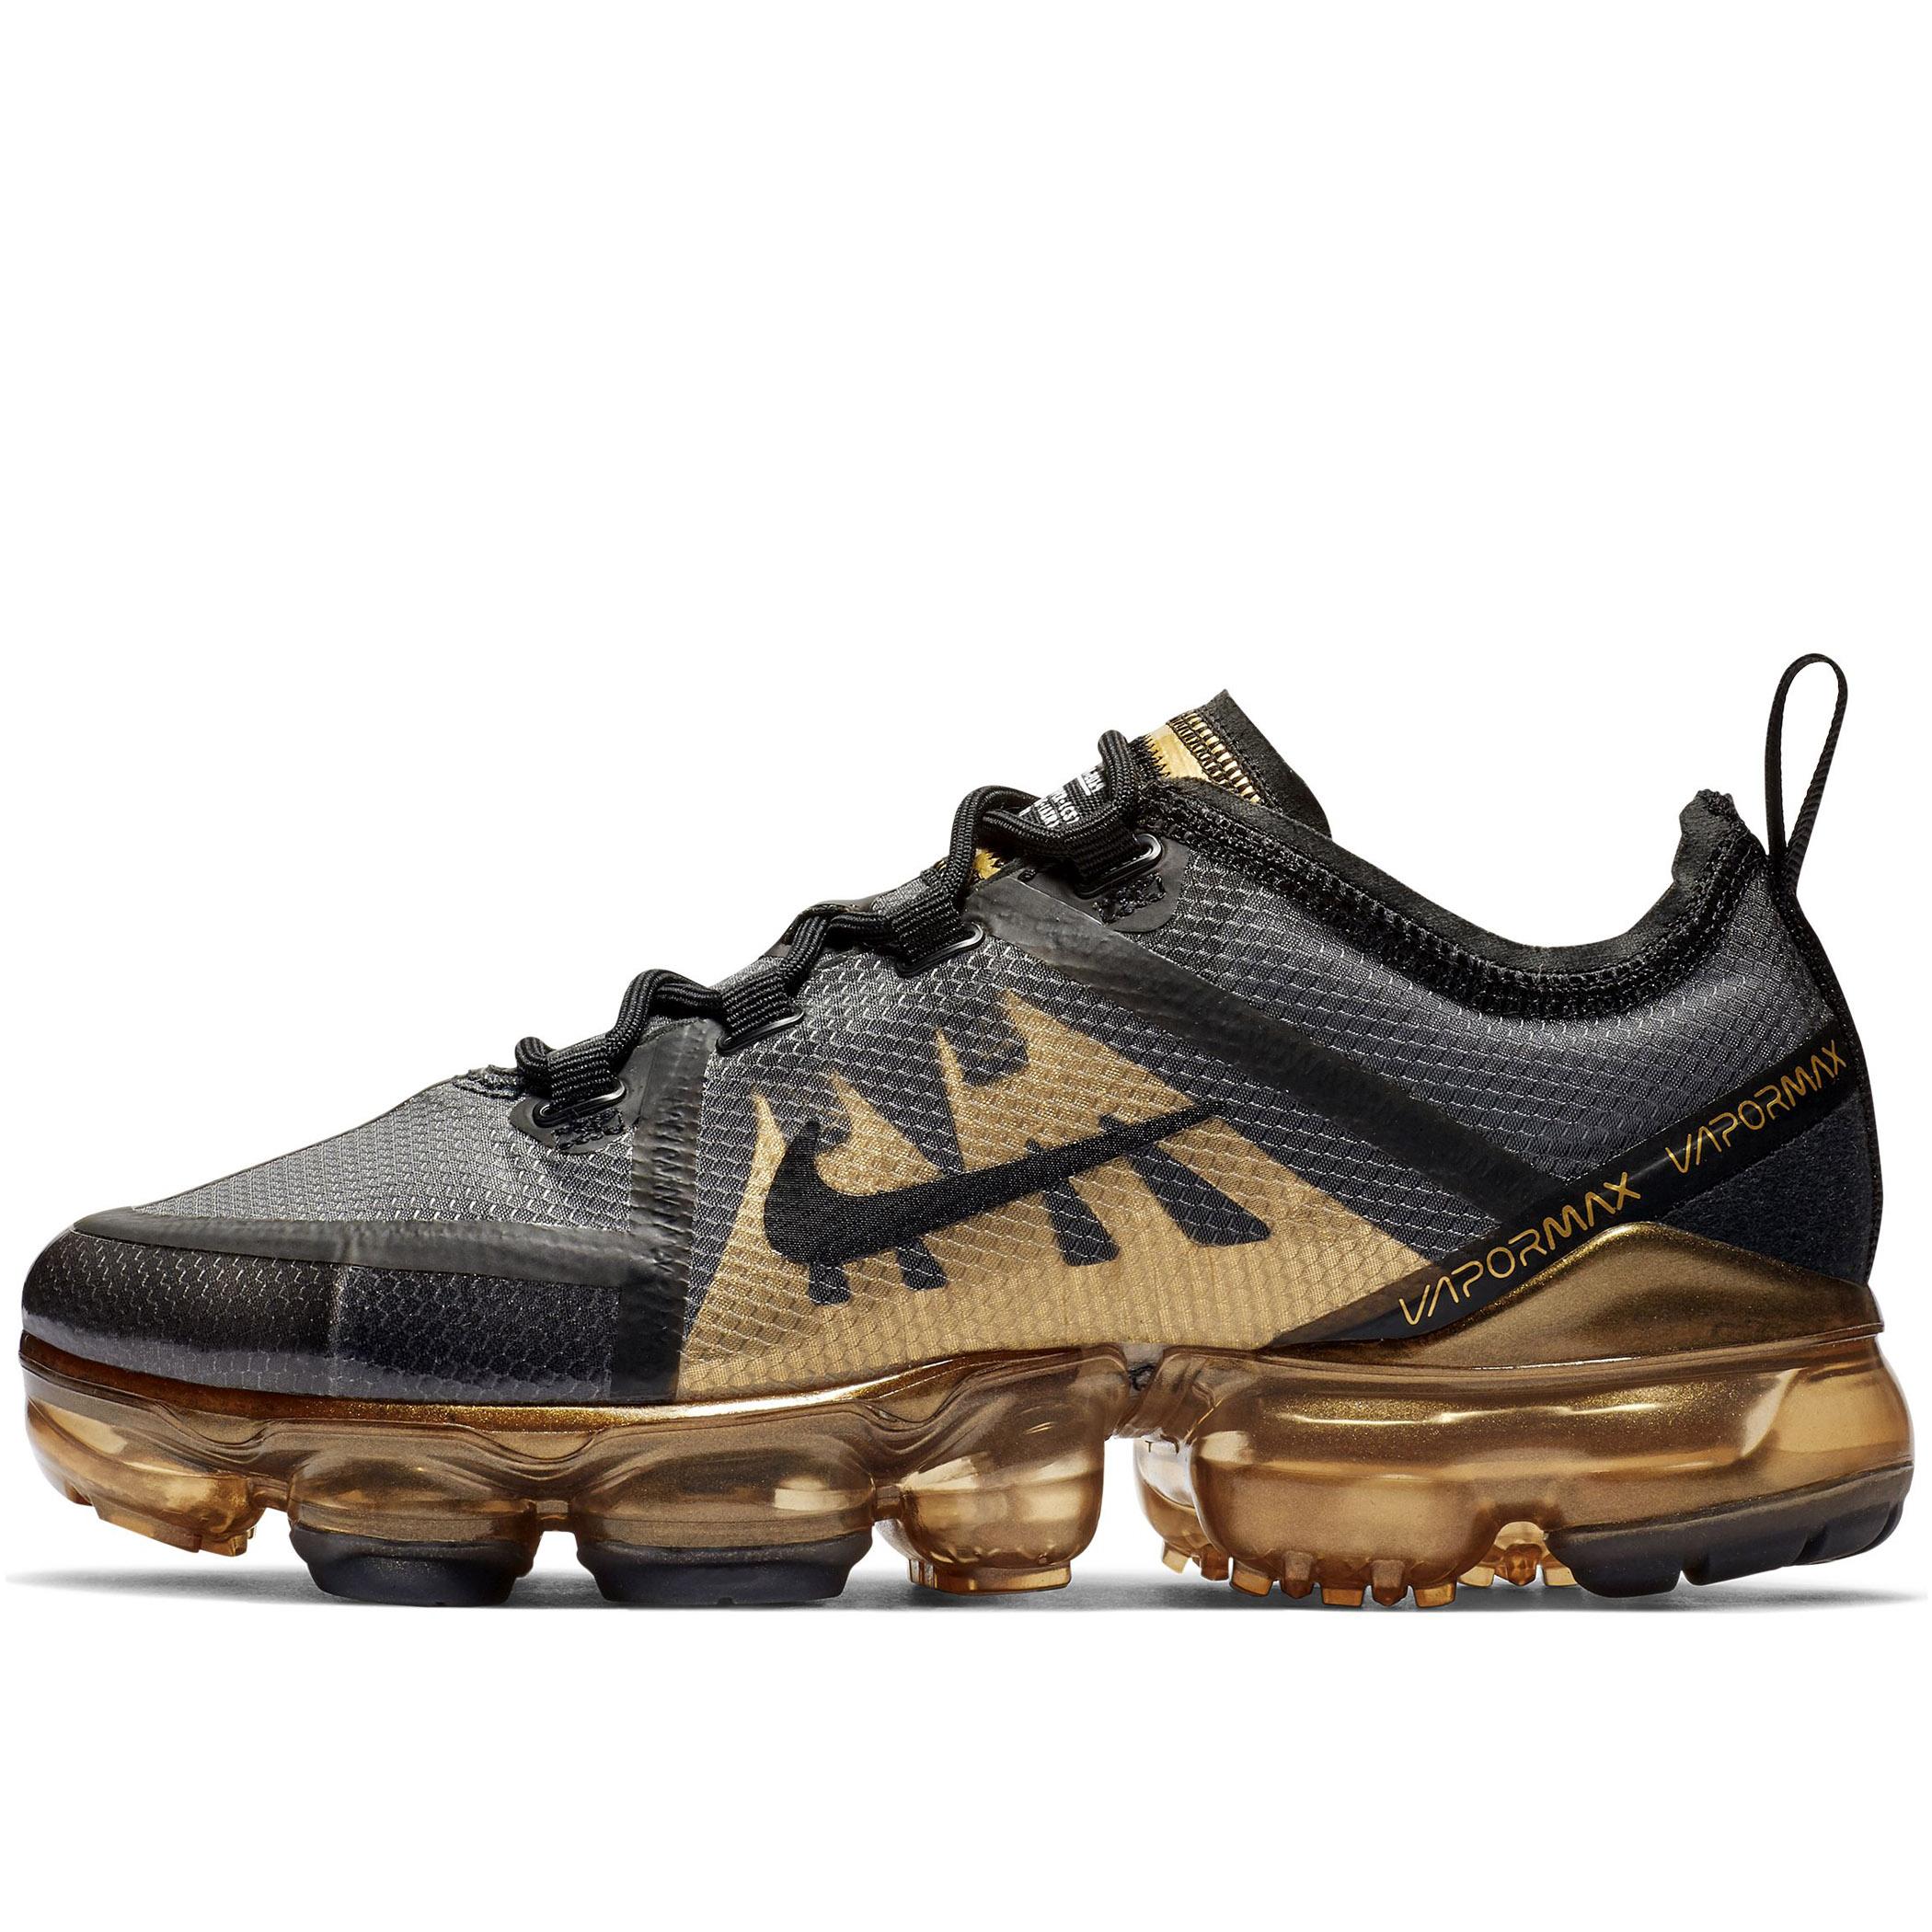 83f44b48 Подростковые кроссовки Nike Air VaporMax 2019 (GS) Black/Metallic Gold -  фото 1